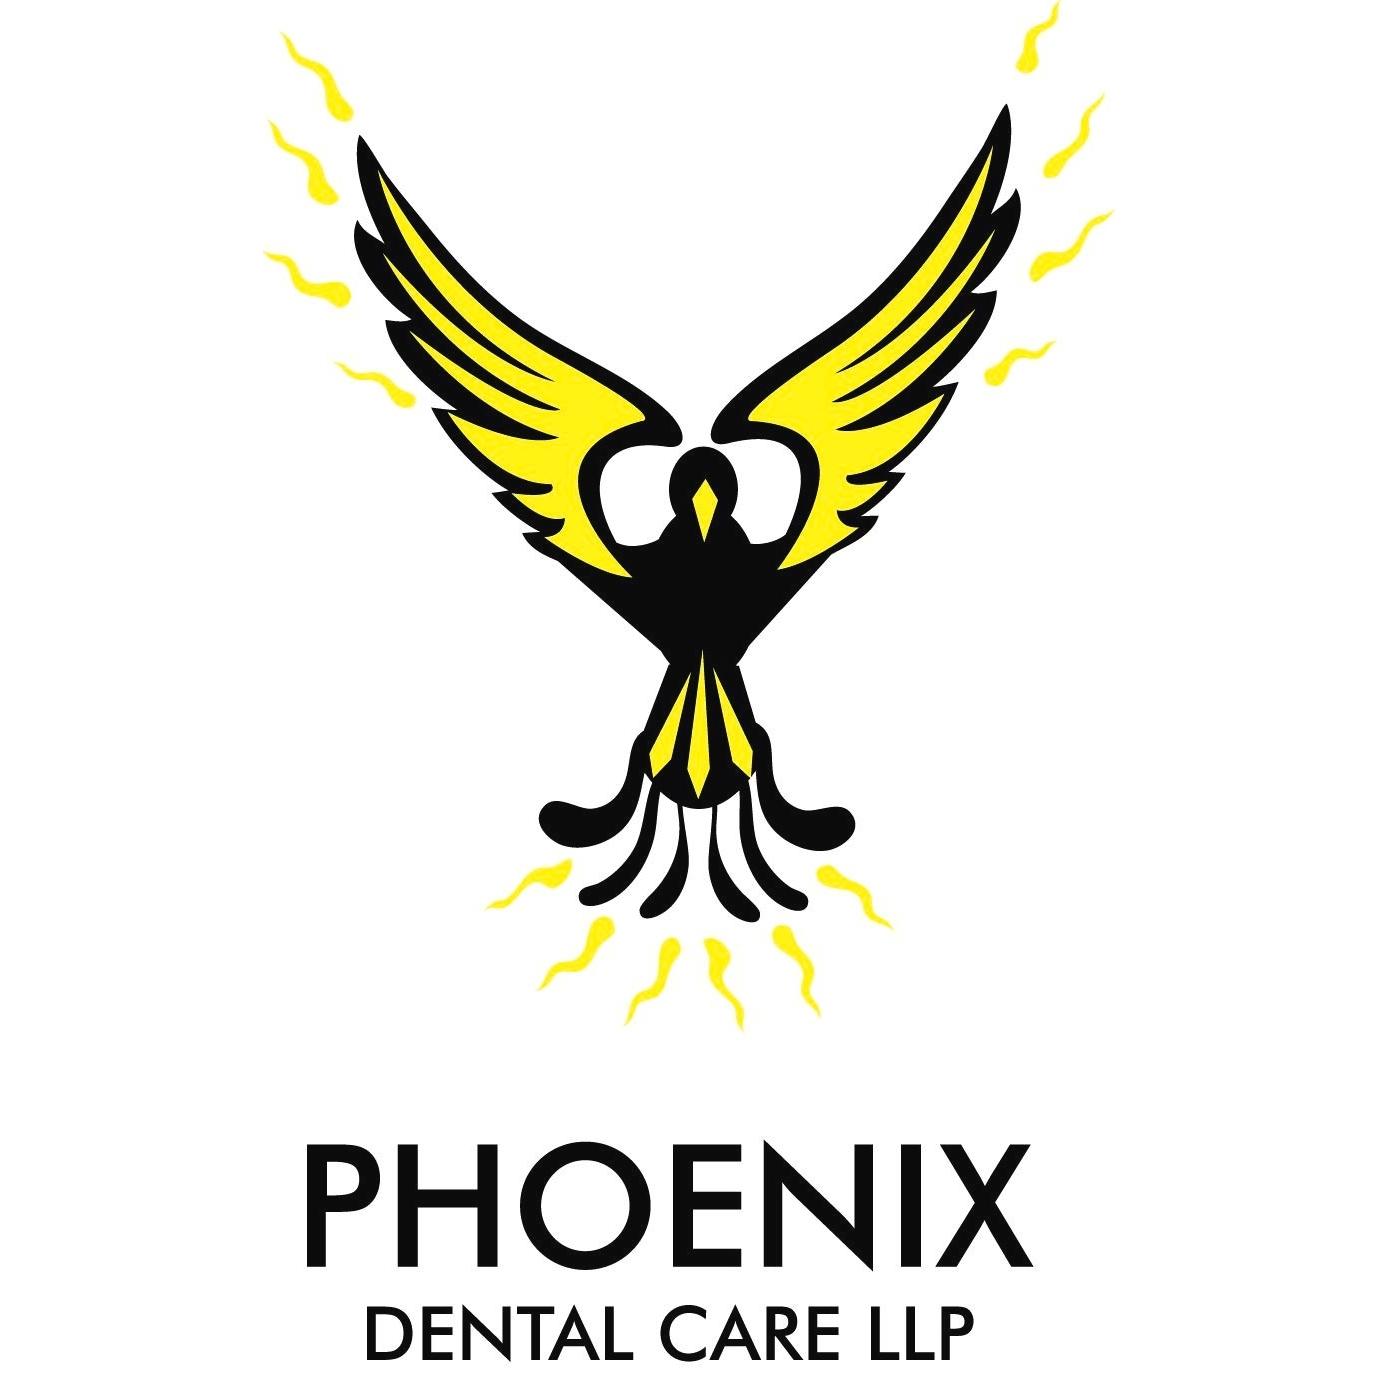 Phoenix Dental Care Ltd - Weymouth, Dorset DT4 9AB - 01305 774370 | ShowMeLocal.com